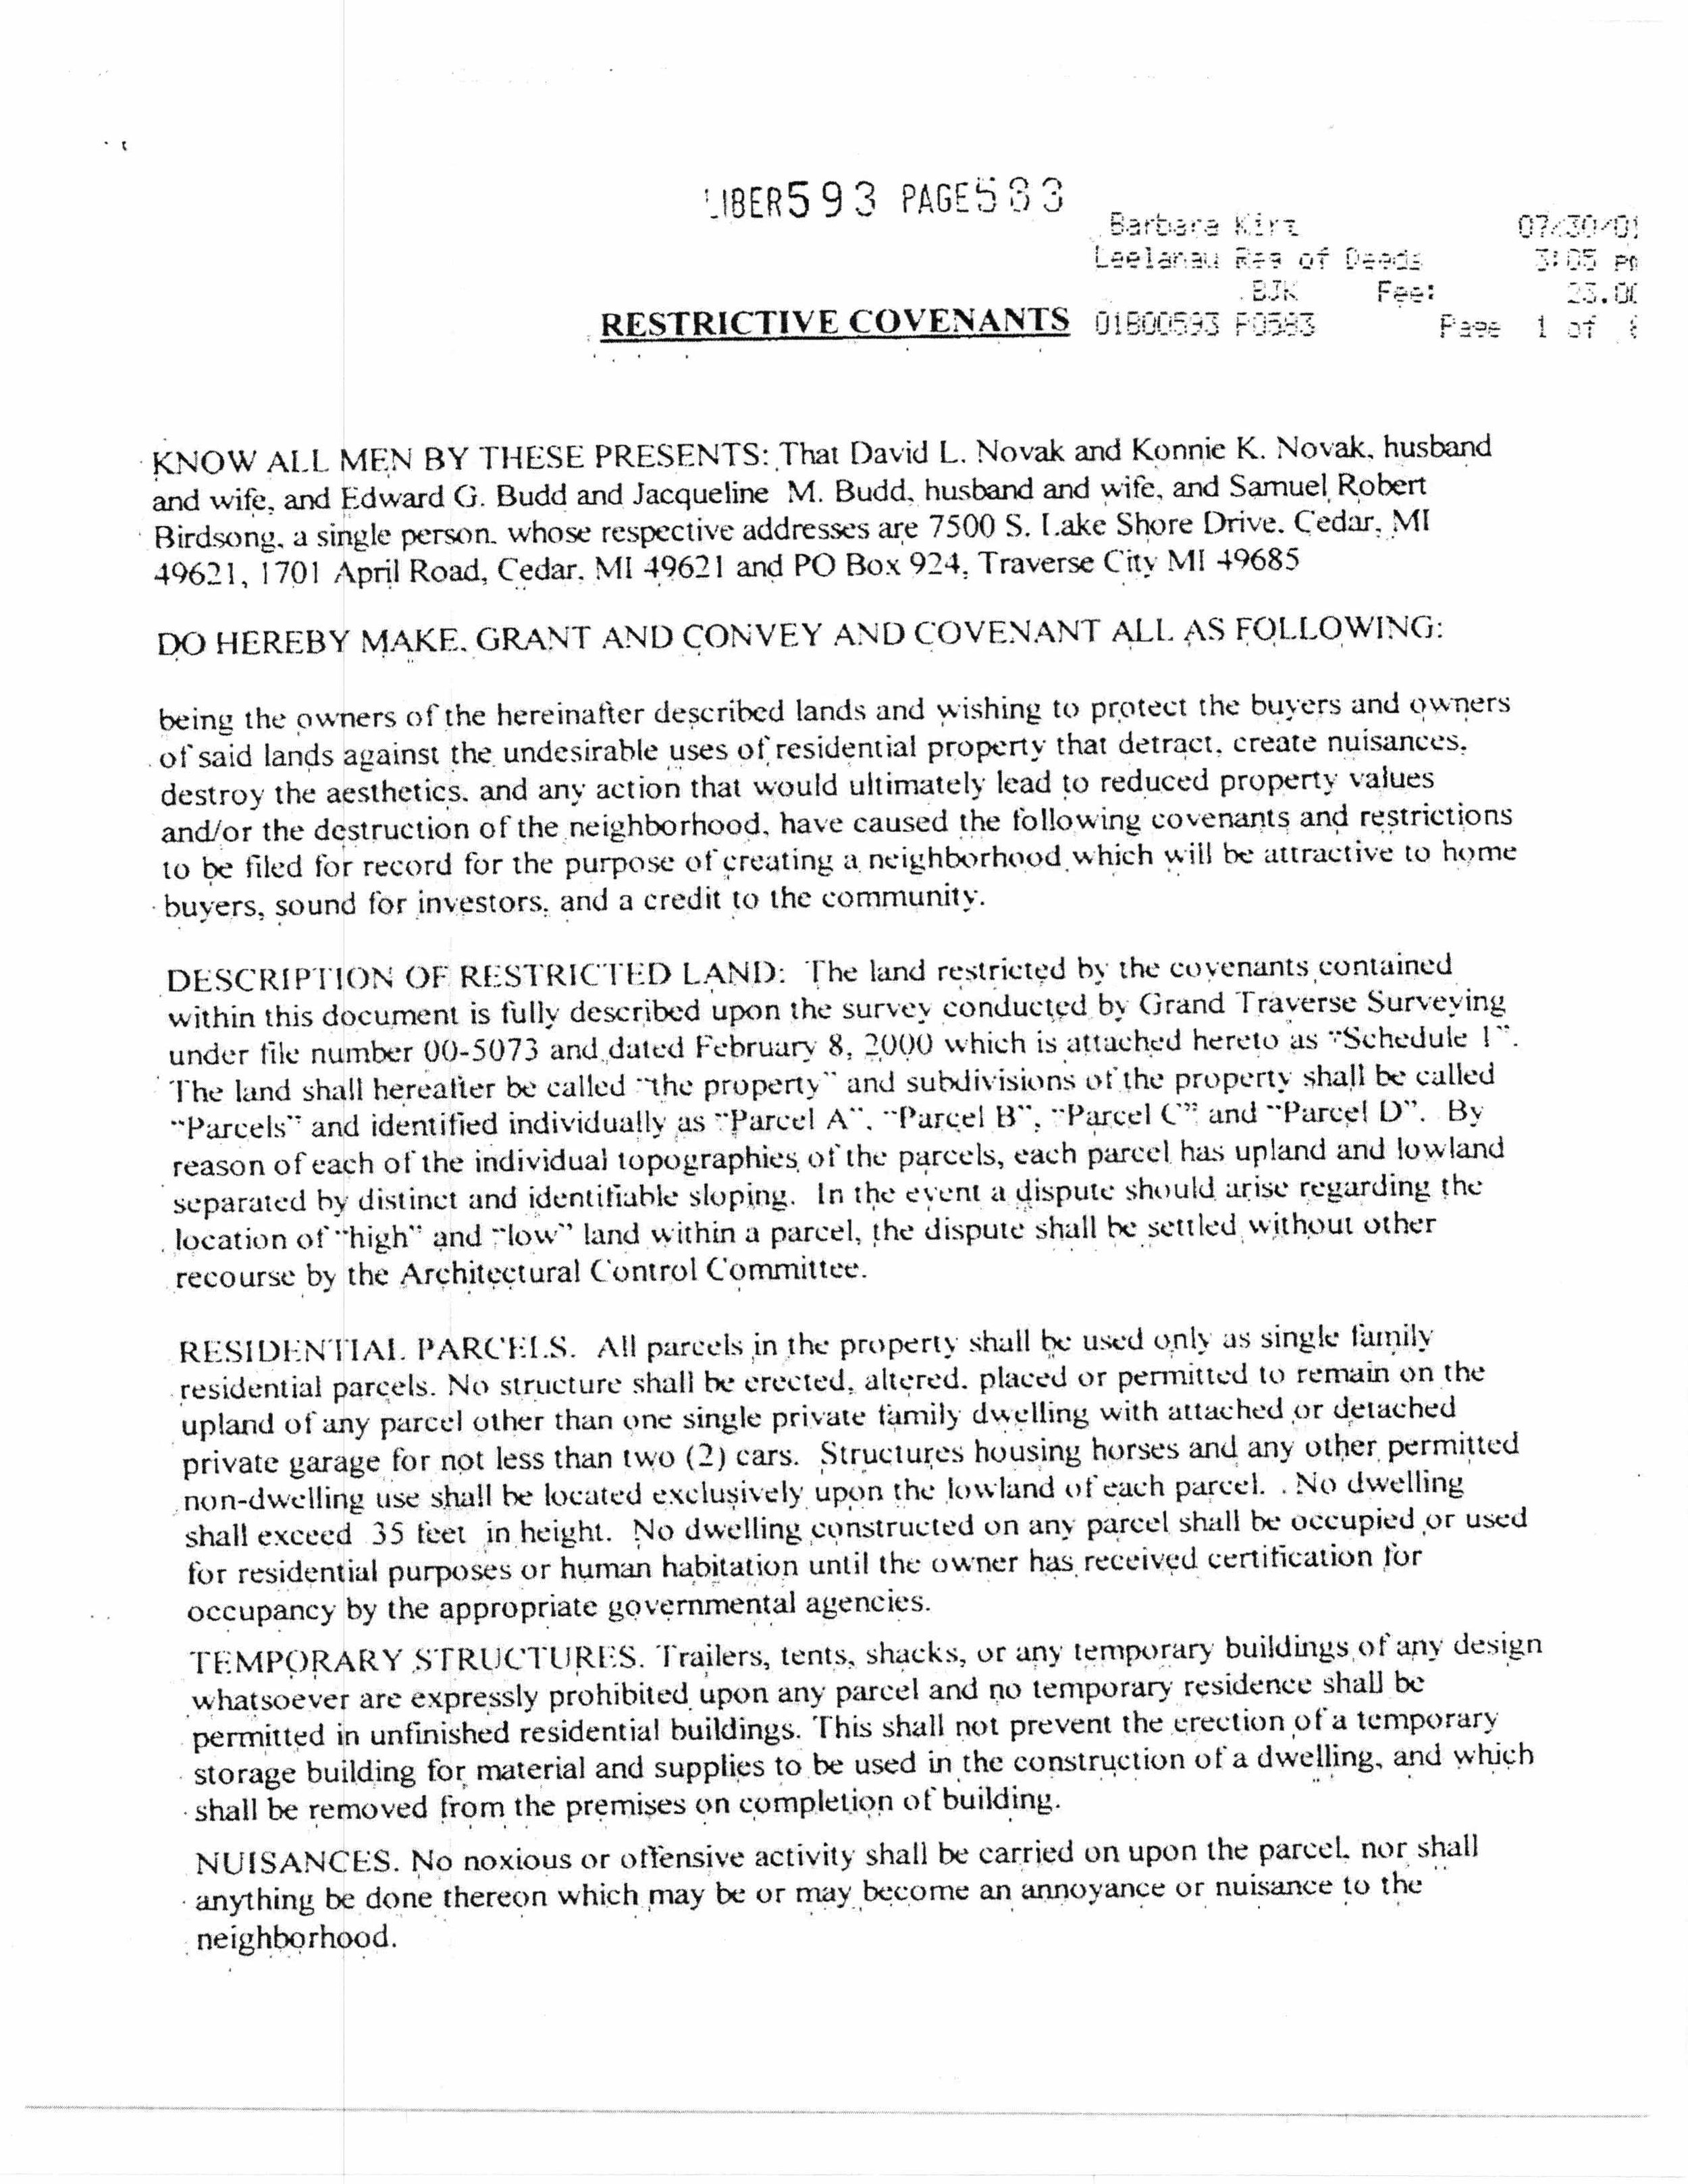 5500 E Hidden Beech, Cedar, MI - For sale by Oltersdorf Realty LLC - Marketing Packet (25).jpg